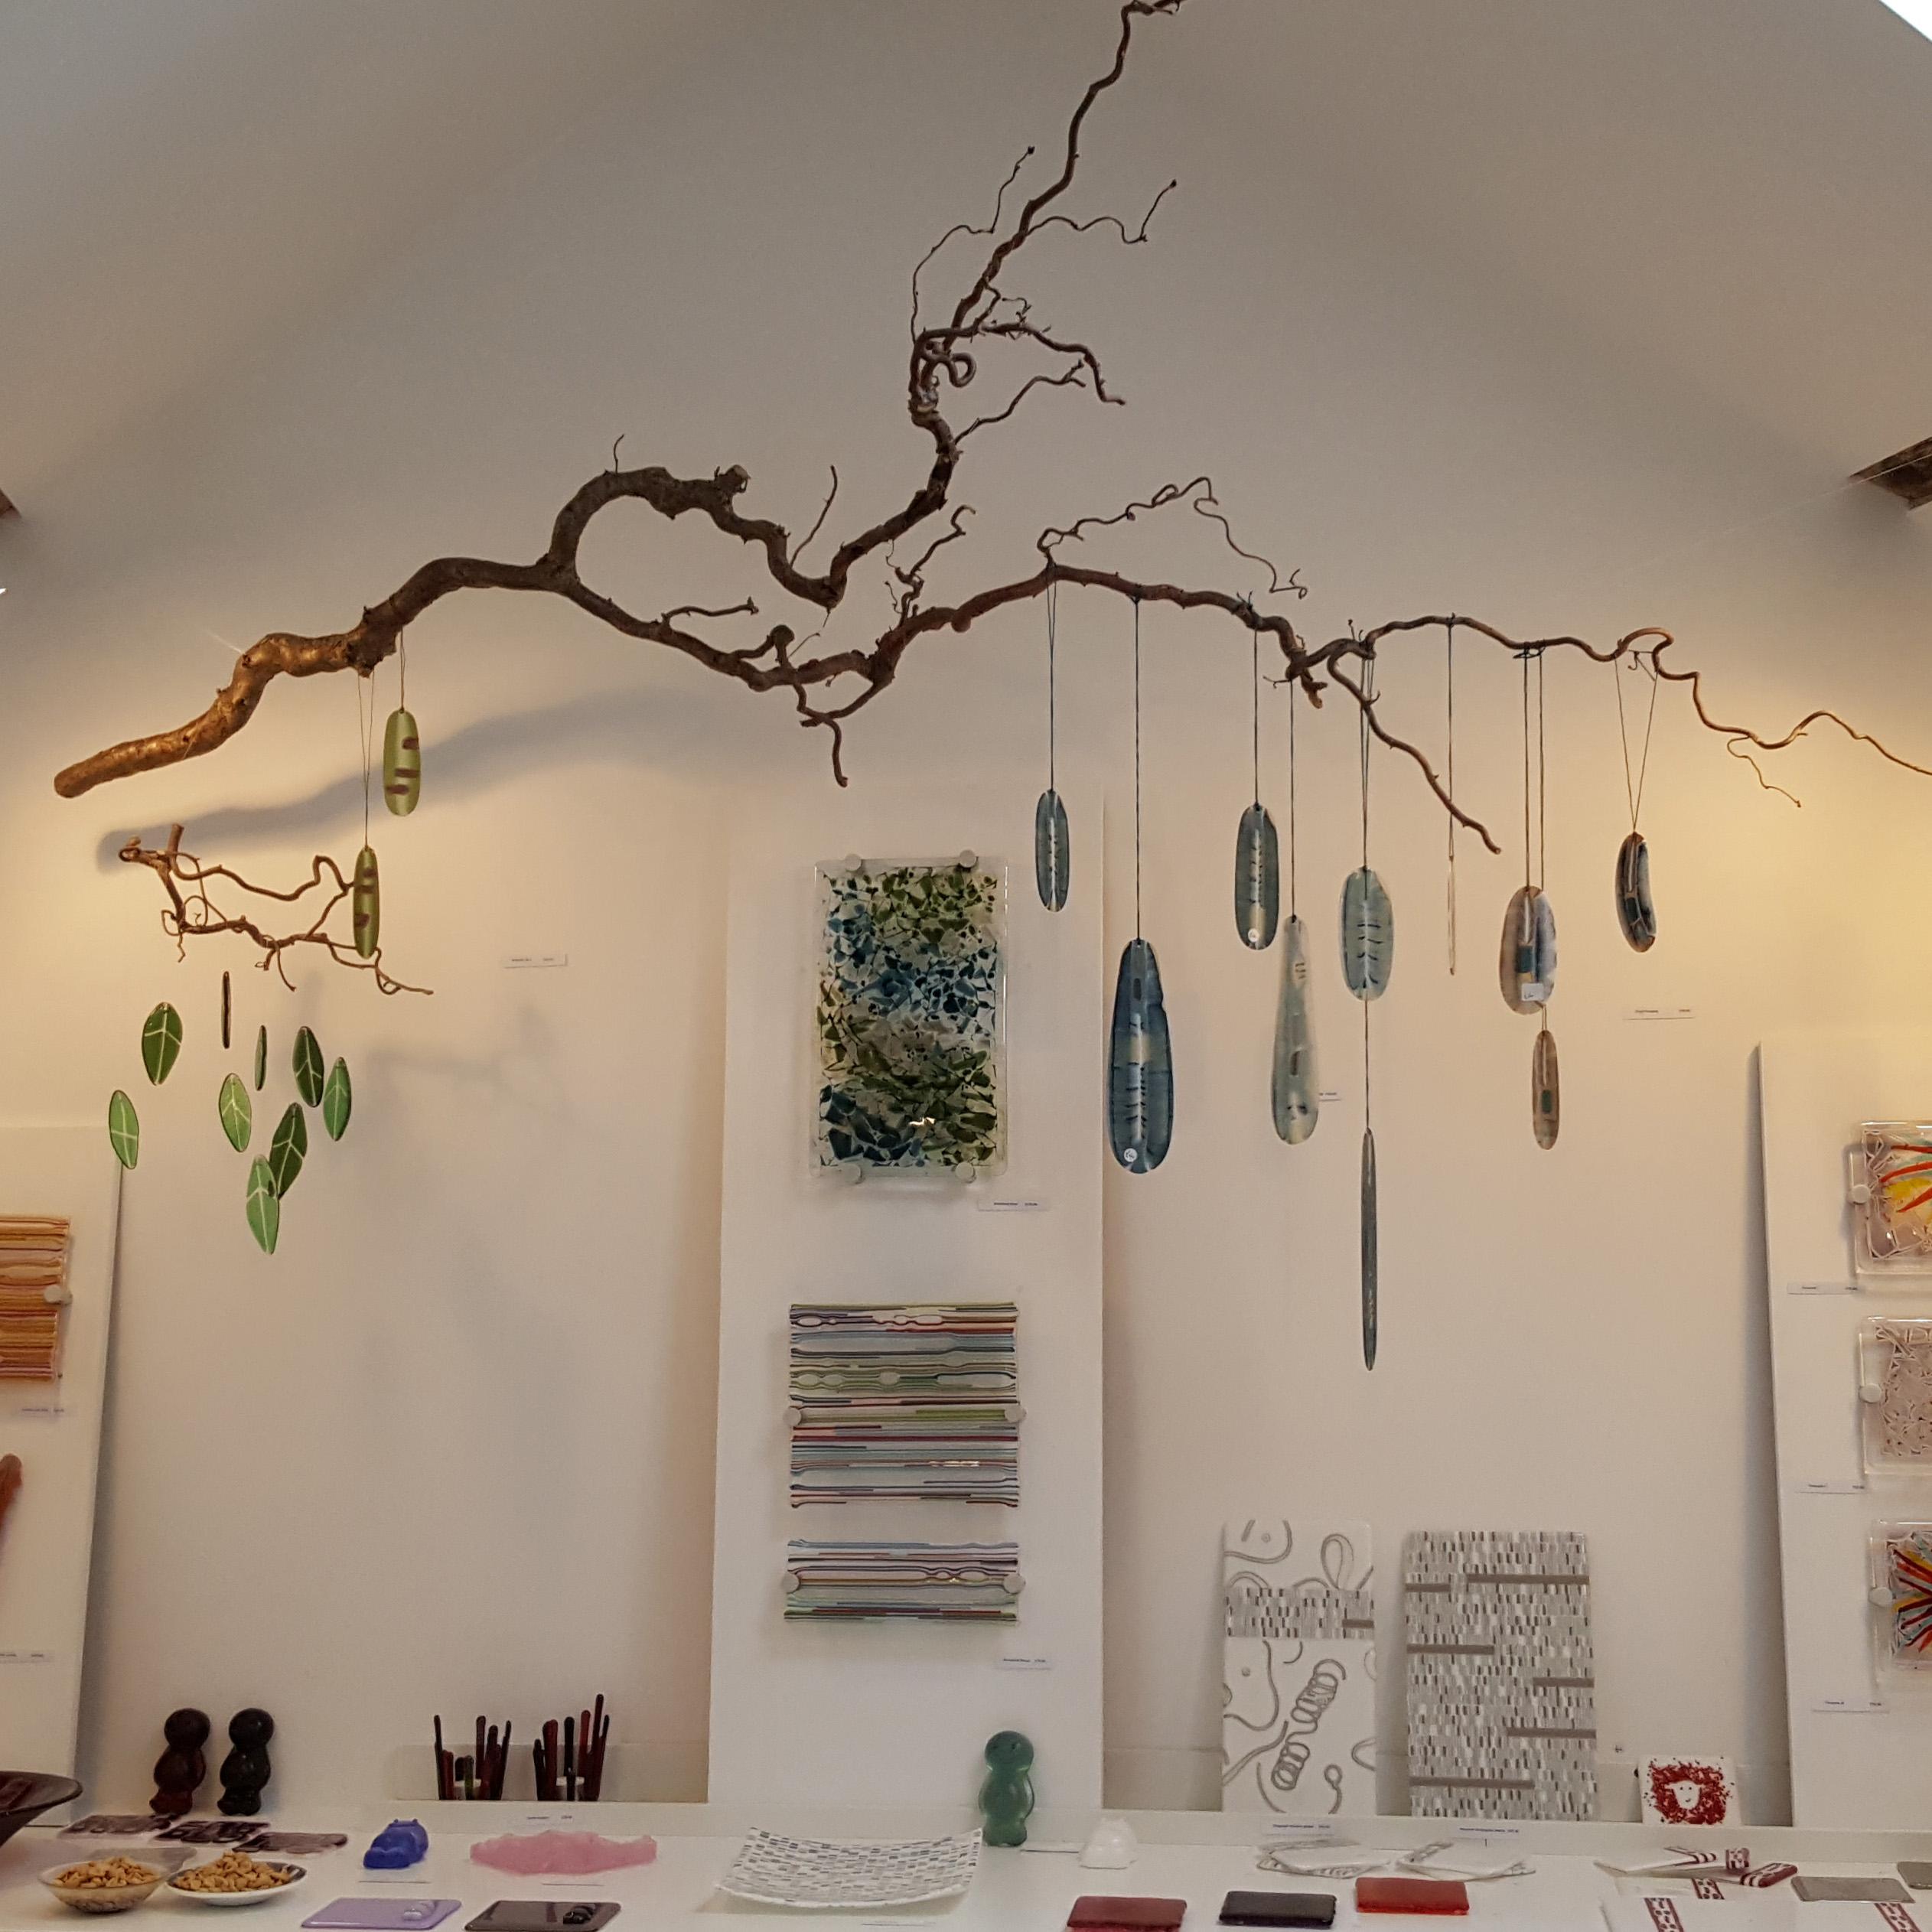 gallery 2017 5x5 crop